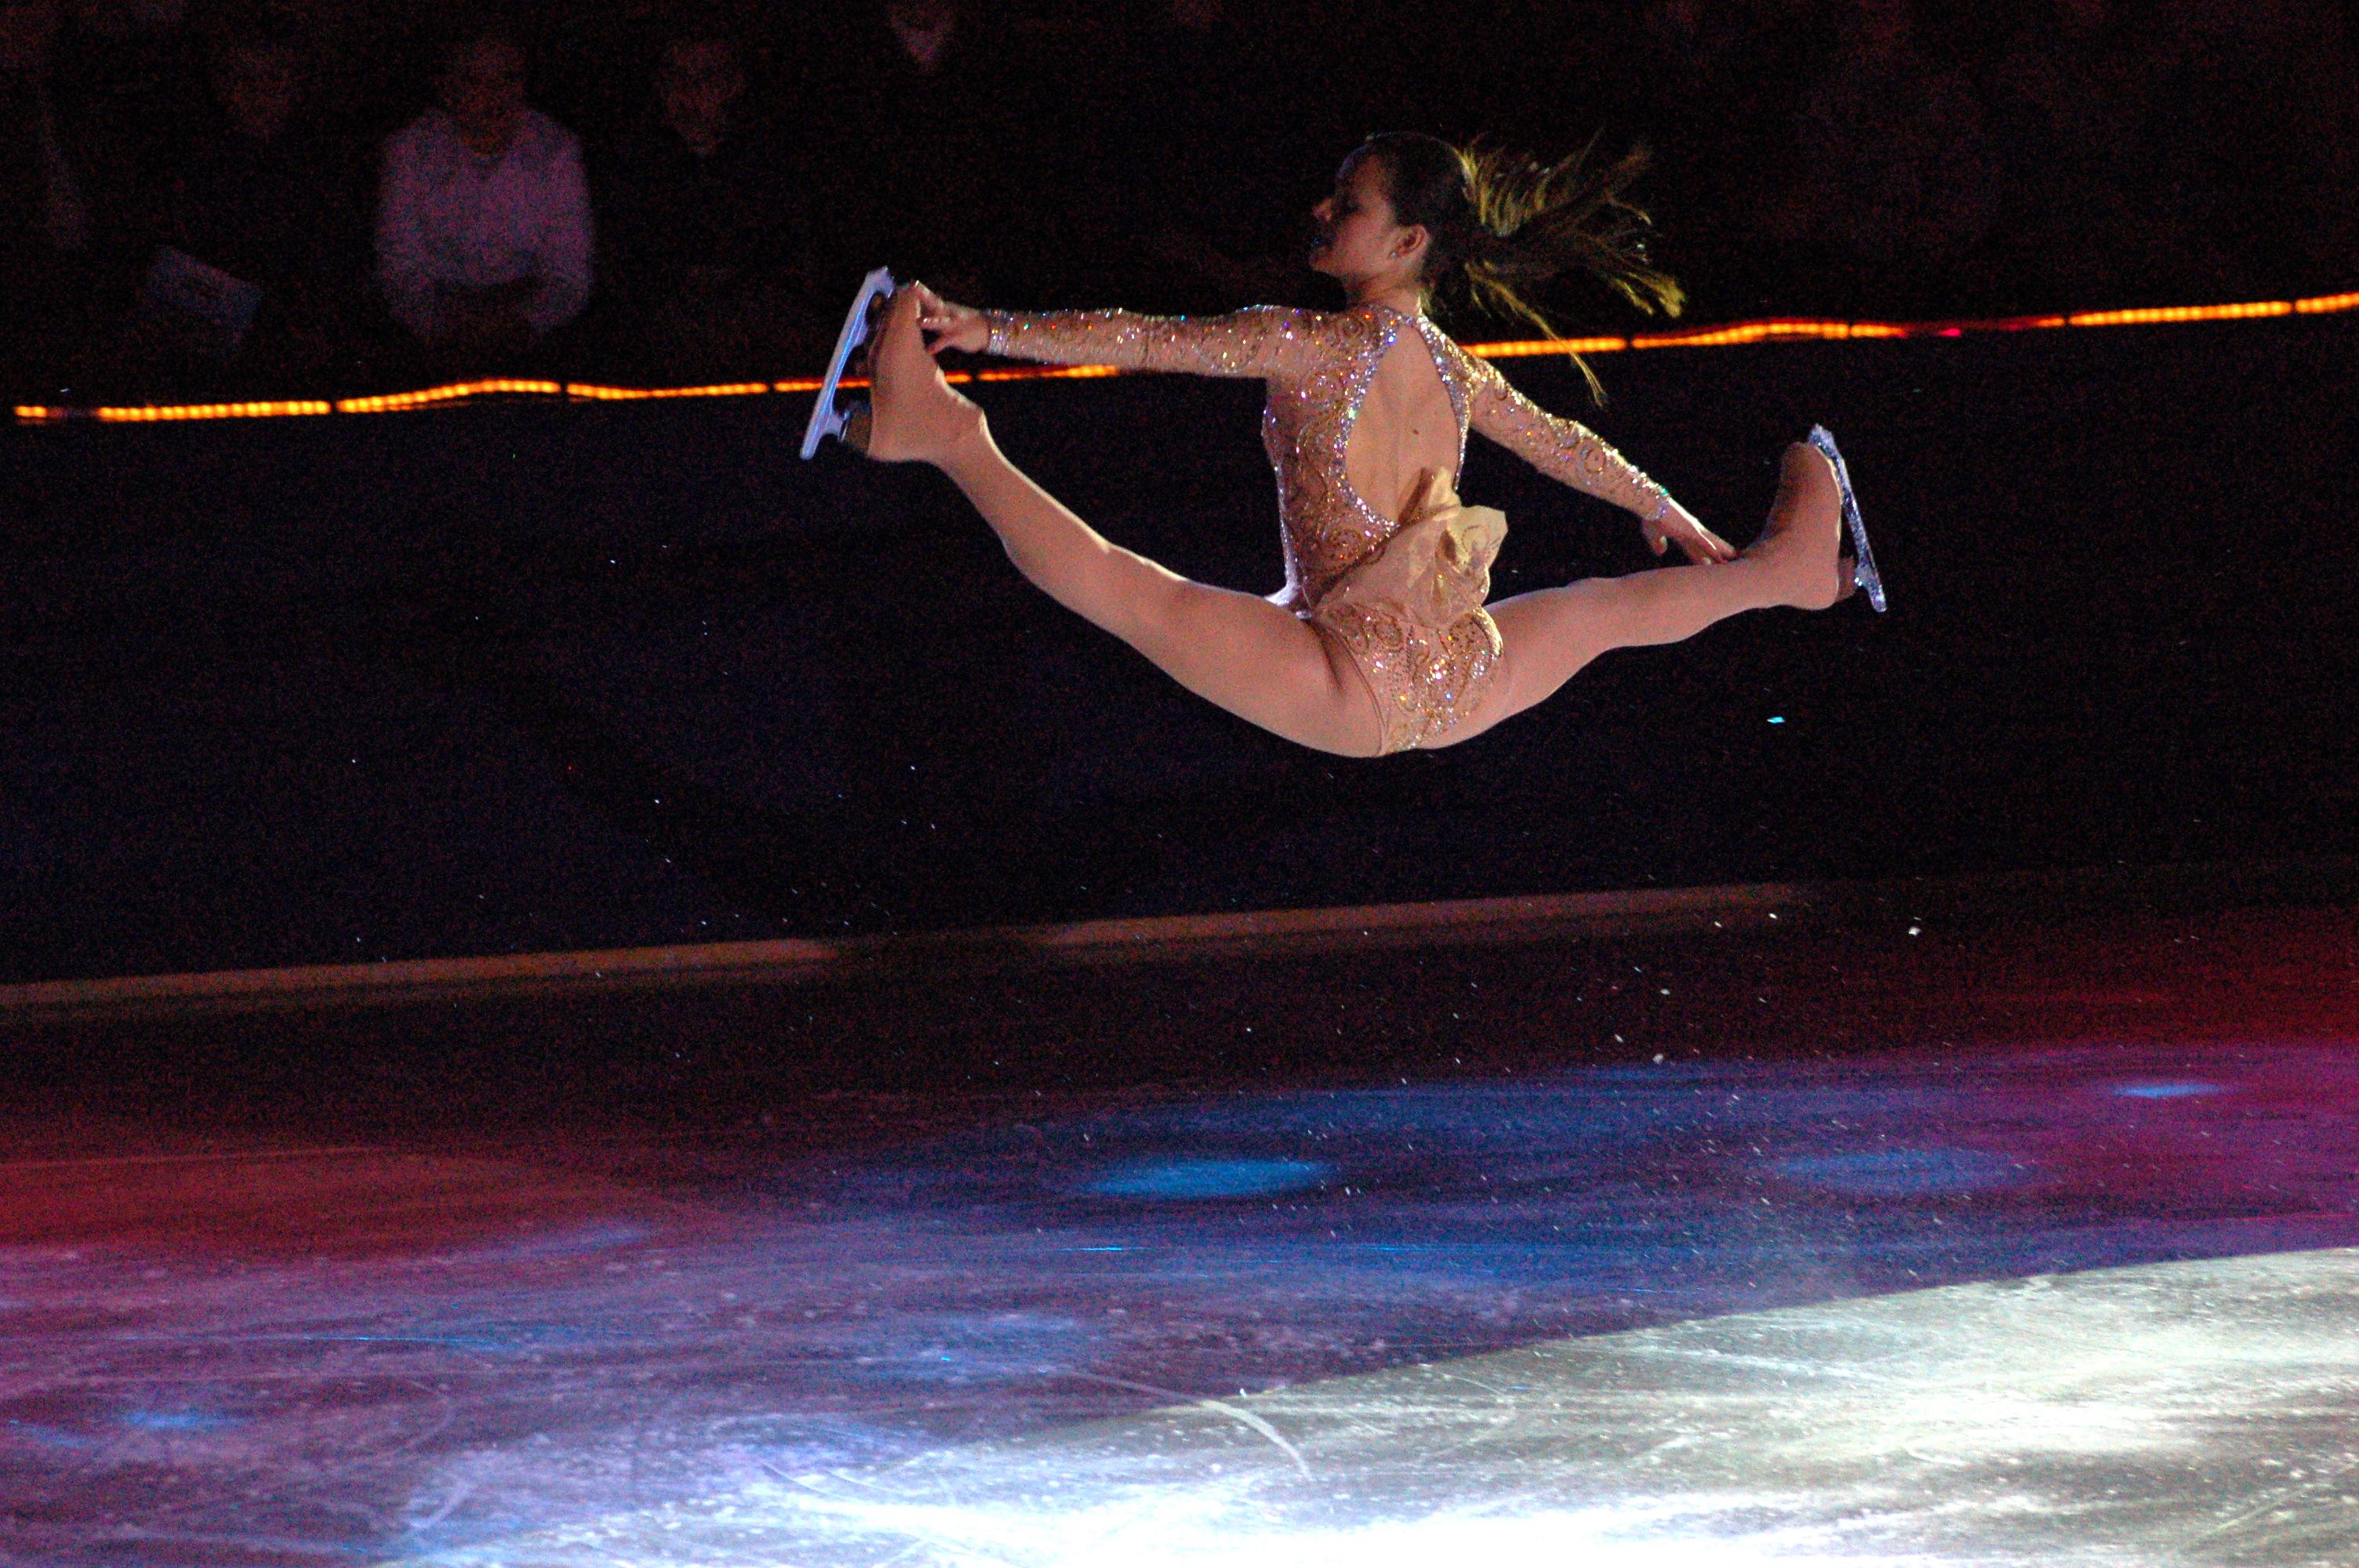 http://upload.wikimedia.org/wikipedia/commons/8/8b/Sasha_Cohen_Split_Jump.jpg